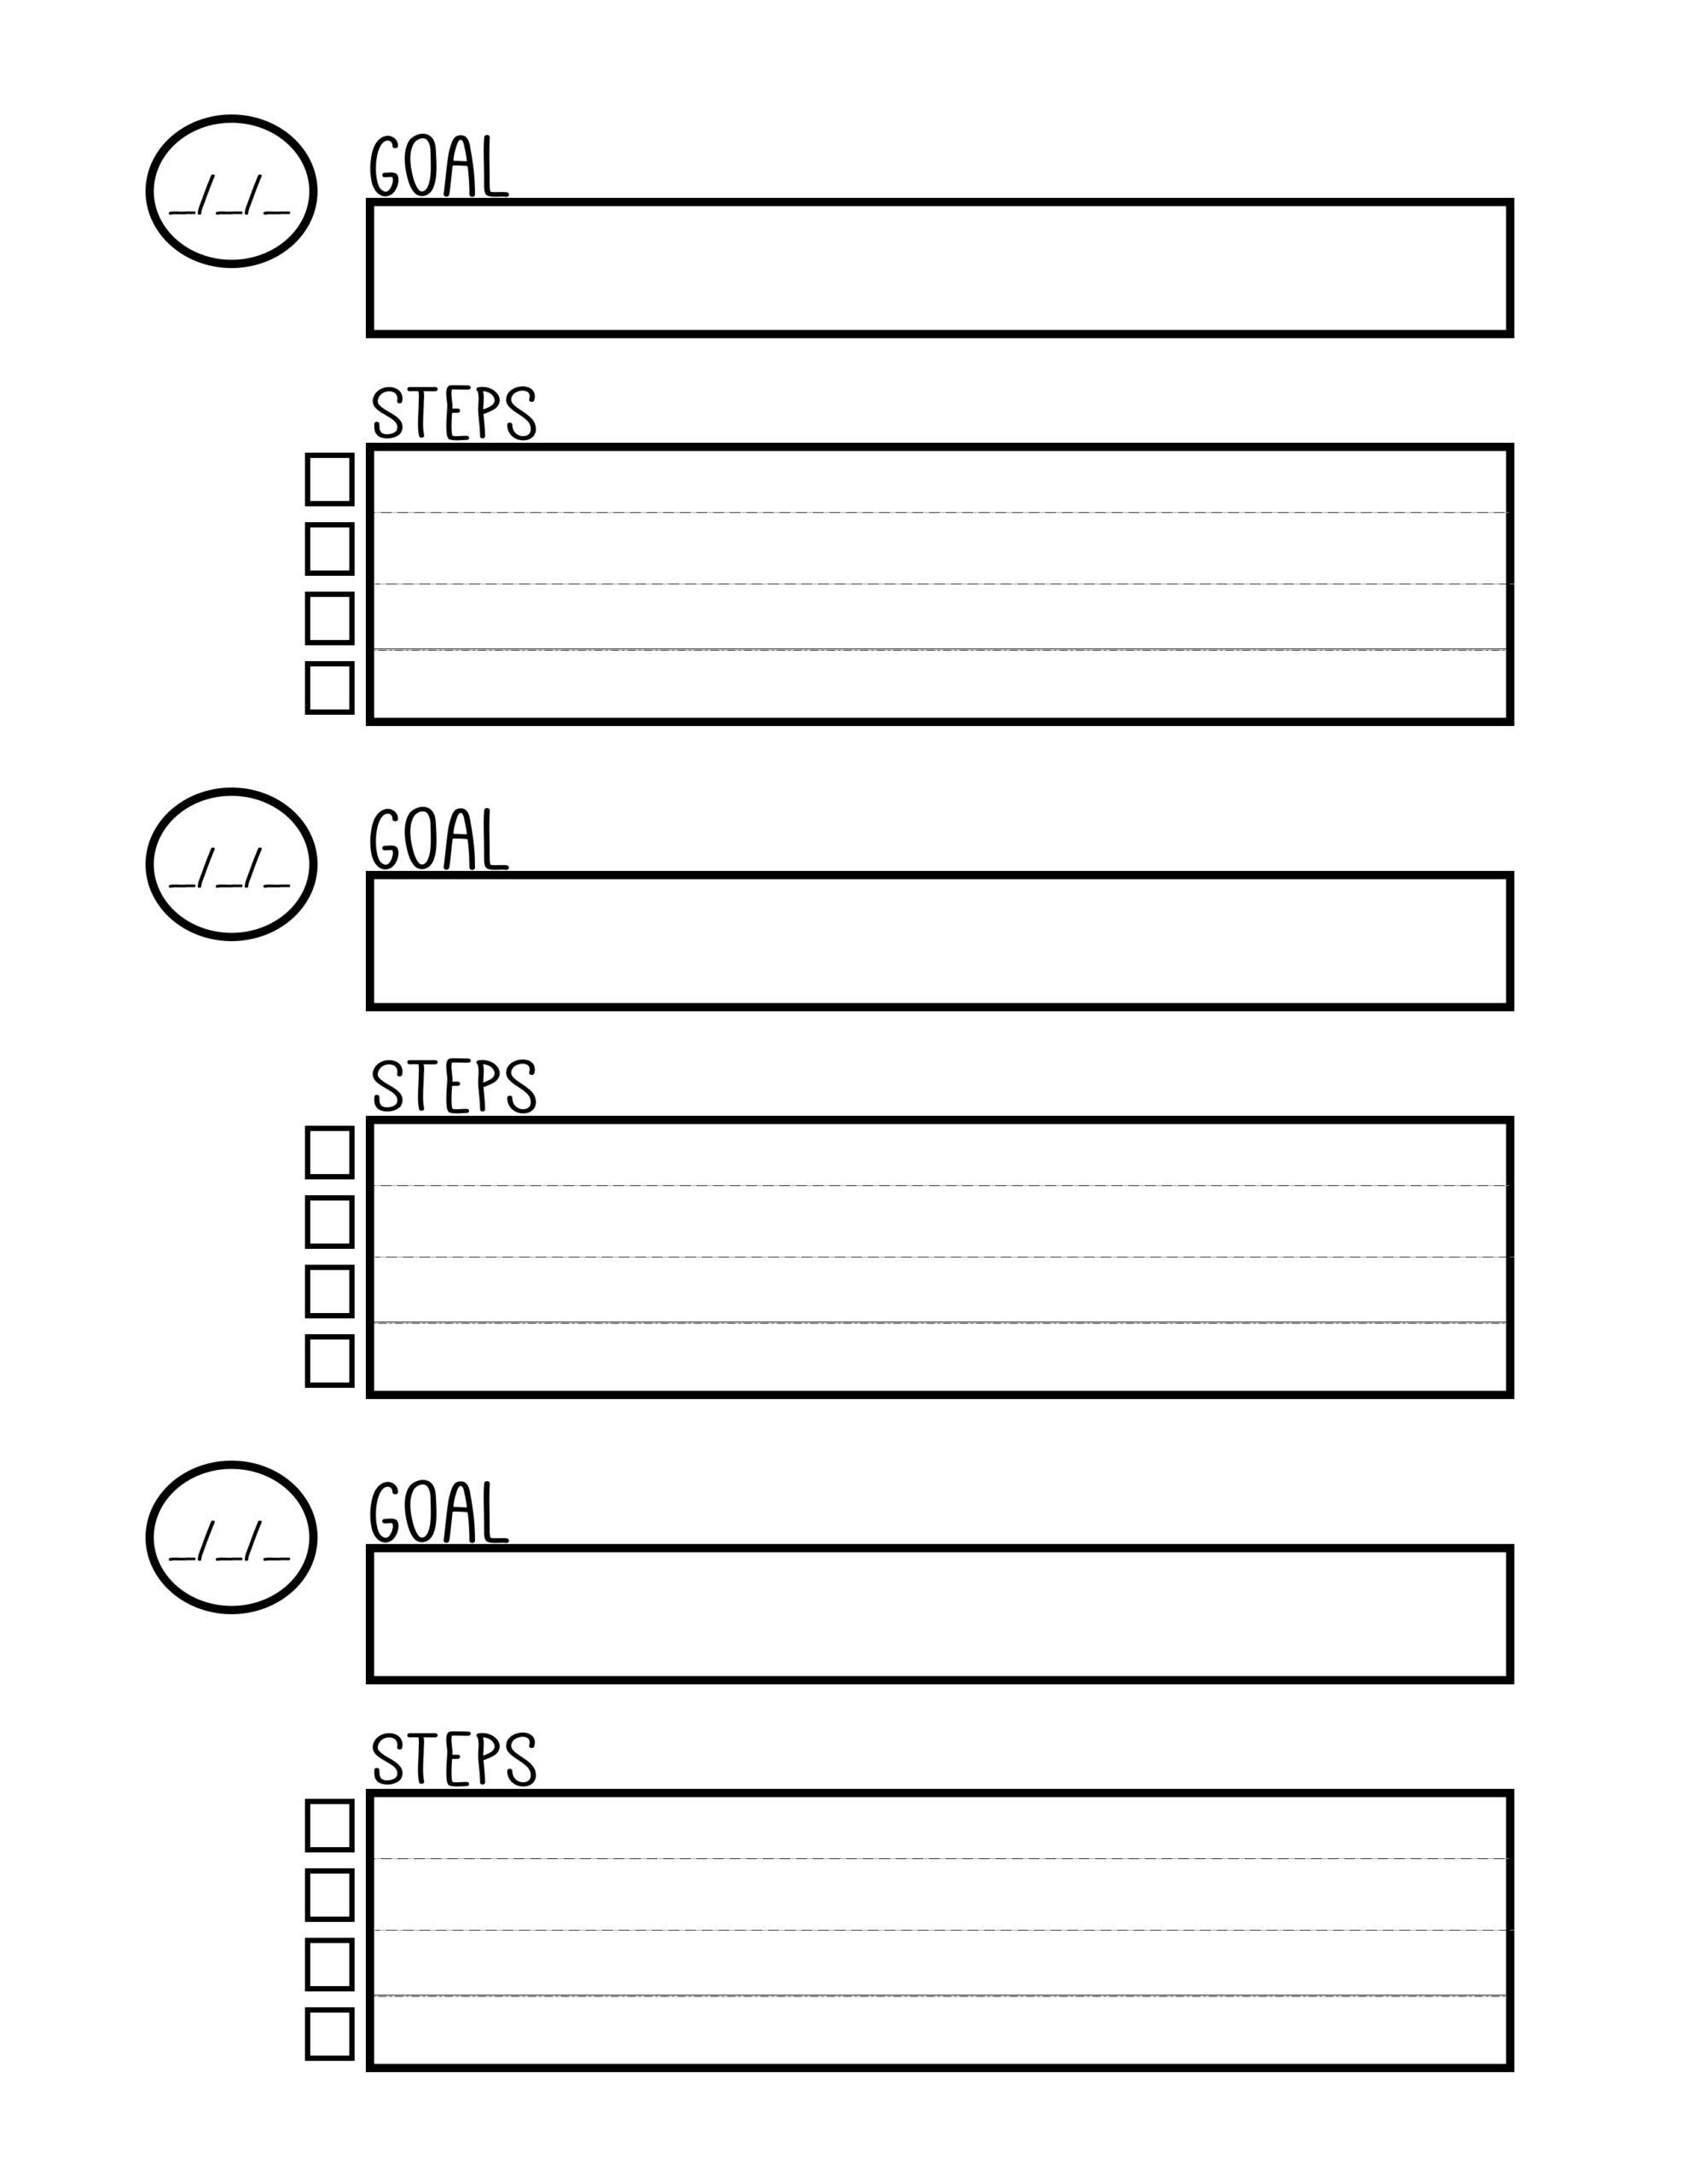 15 Best Images Of Life Goal Printable Worksheet